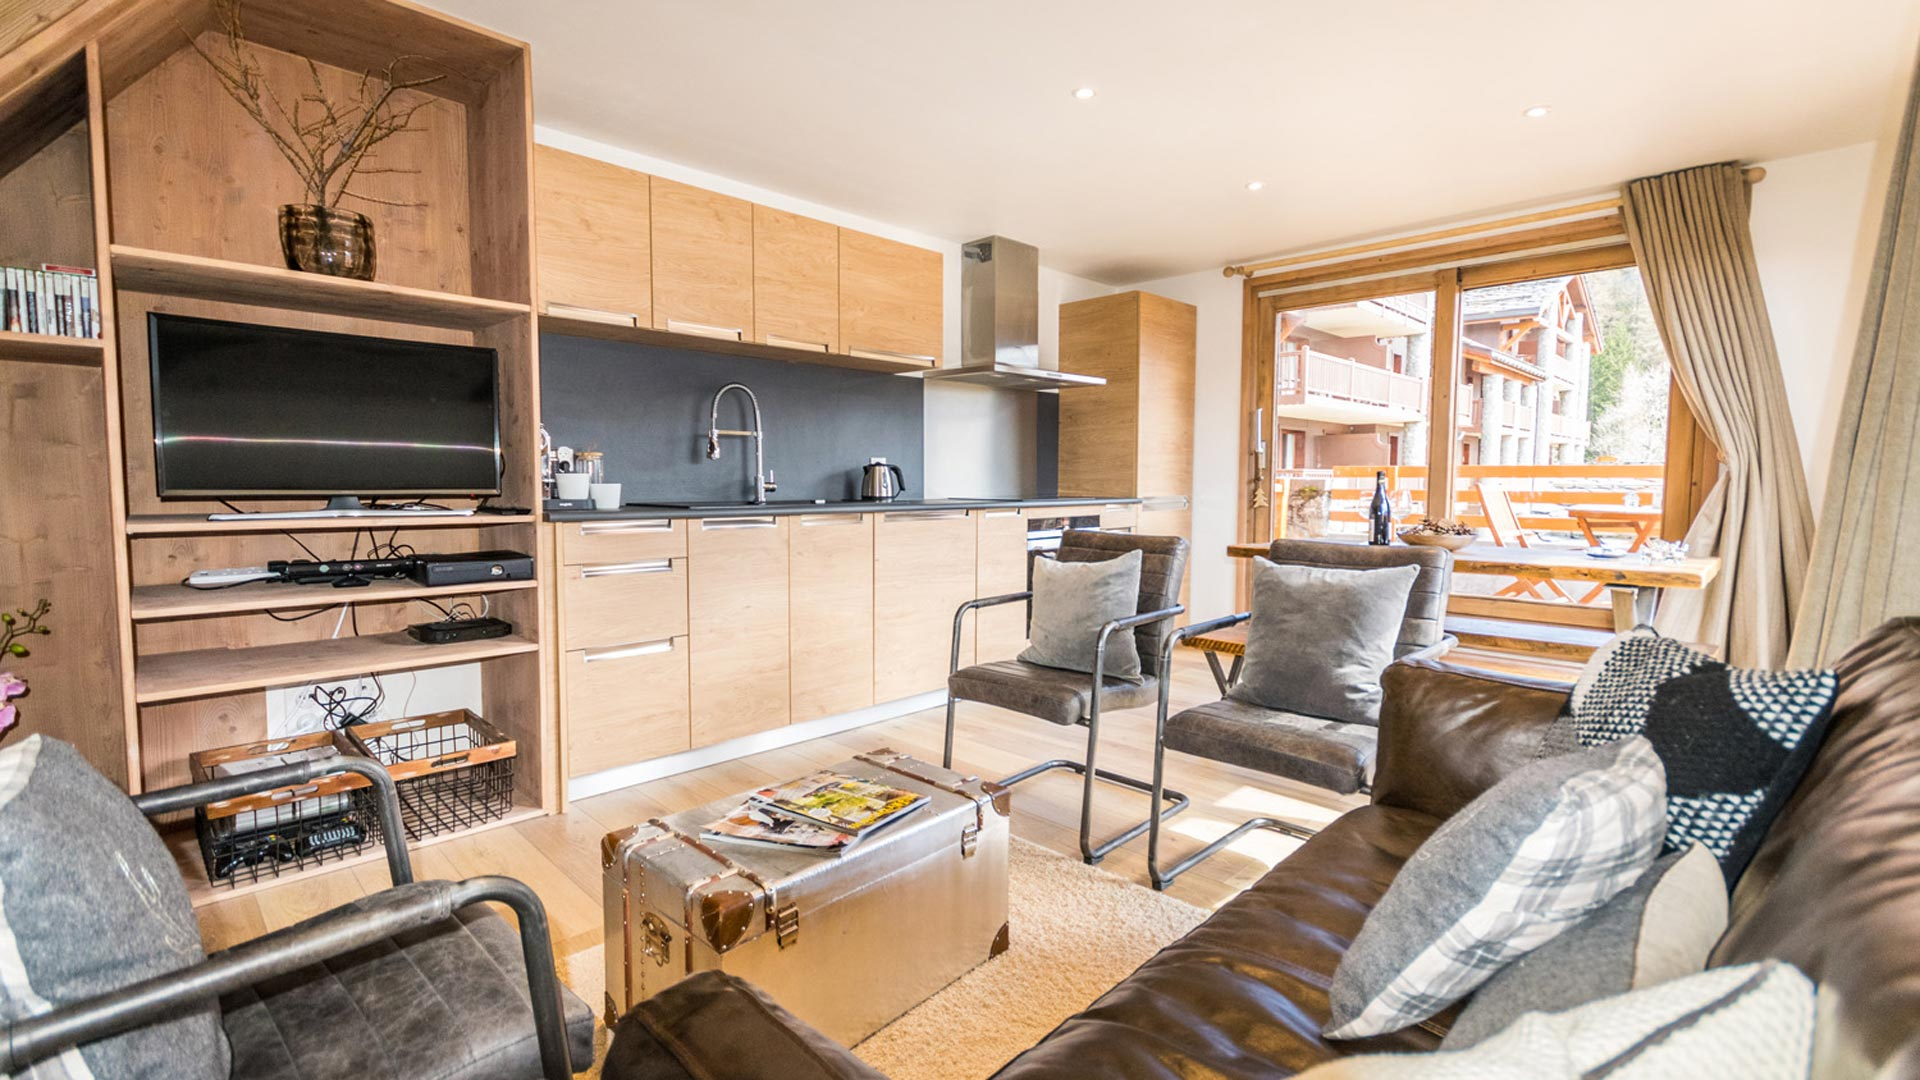 Living Area in Flocon De Neige Apartment in Ste Foy